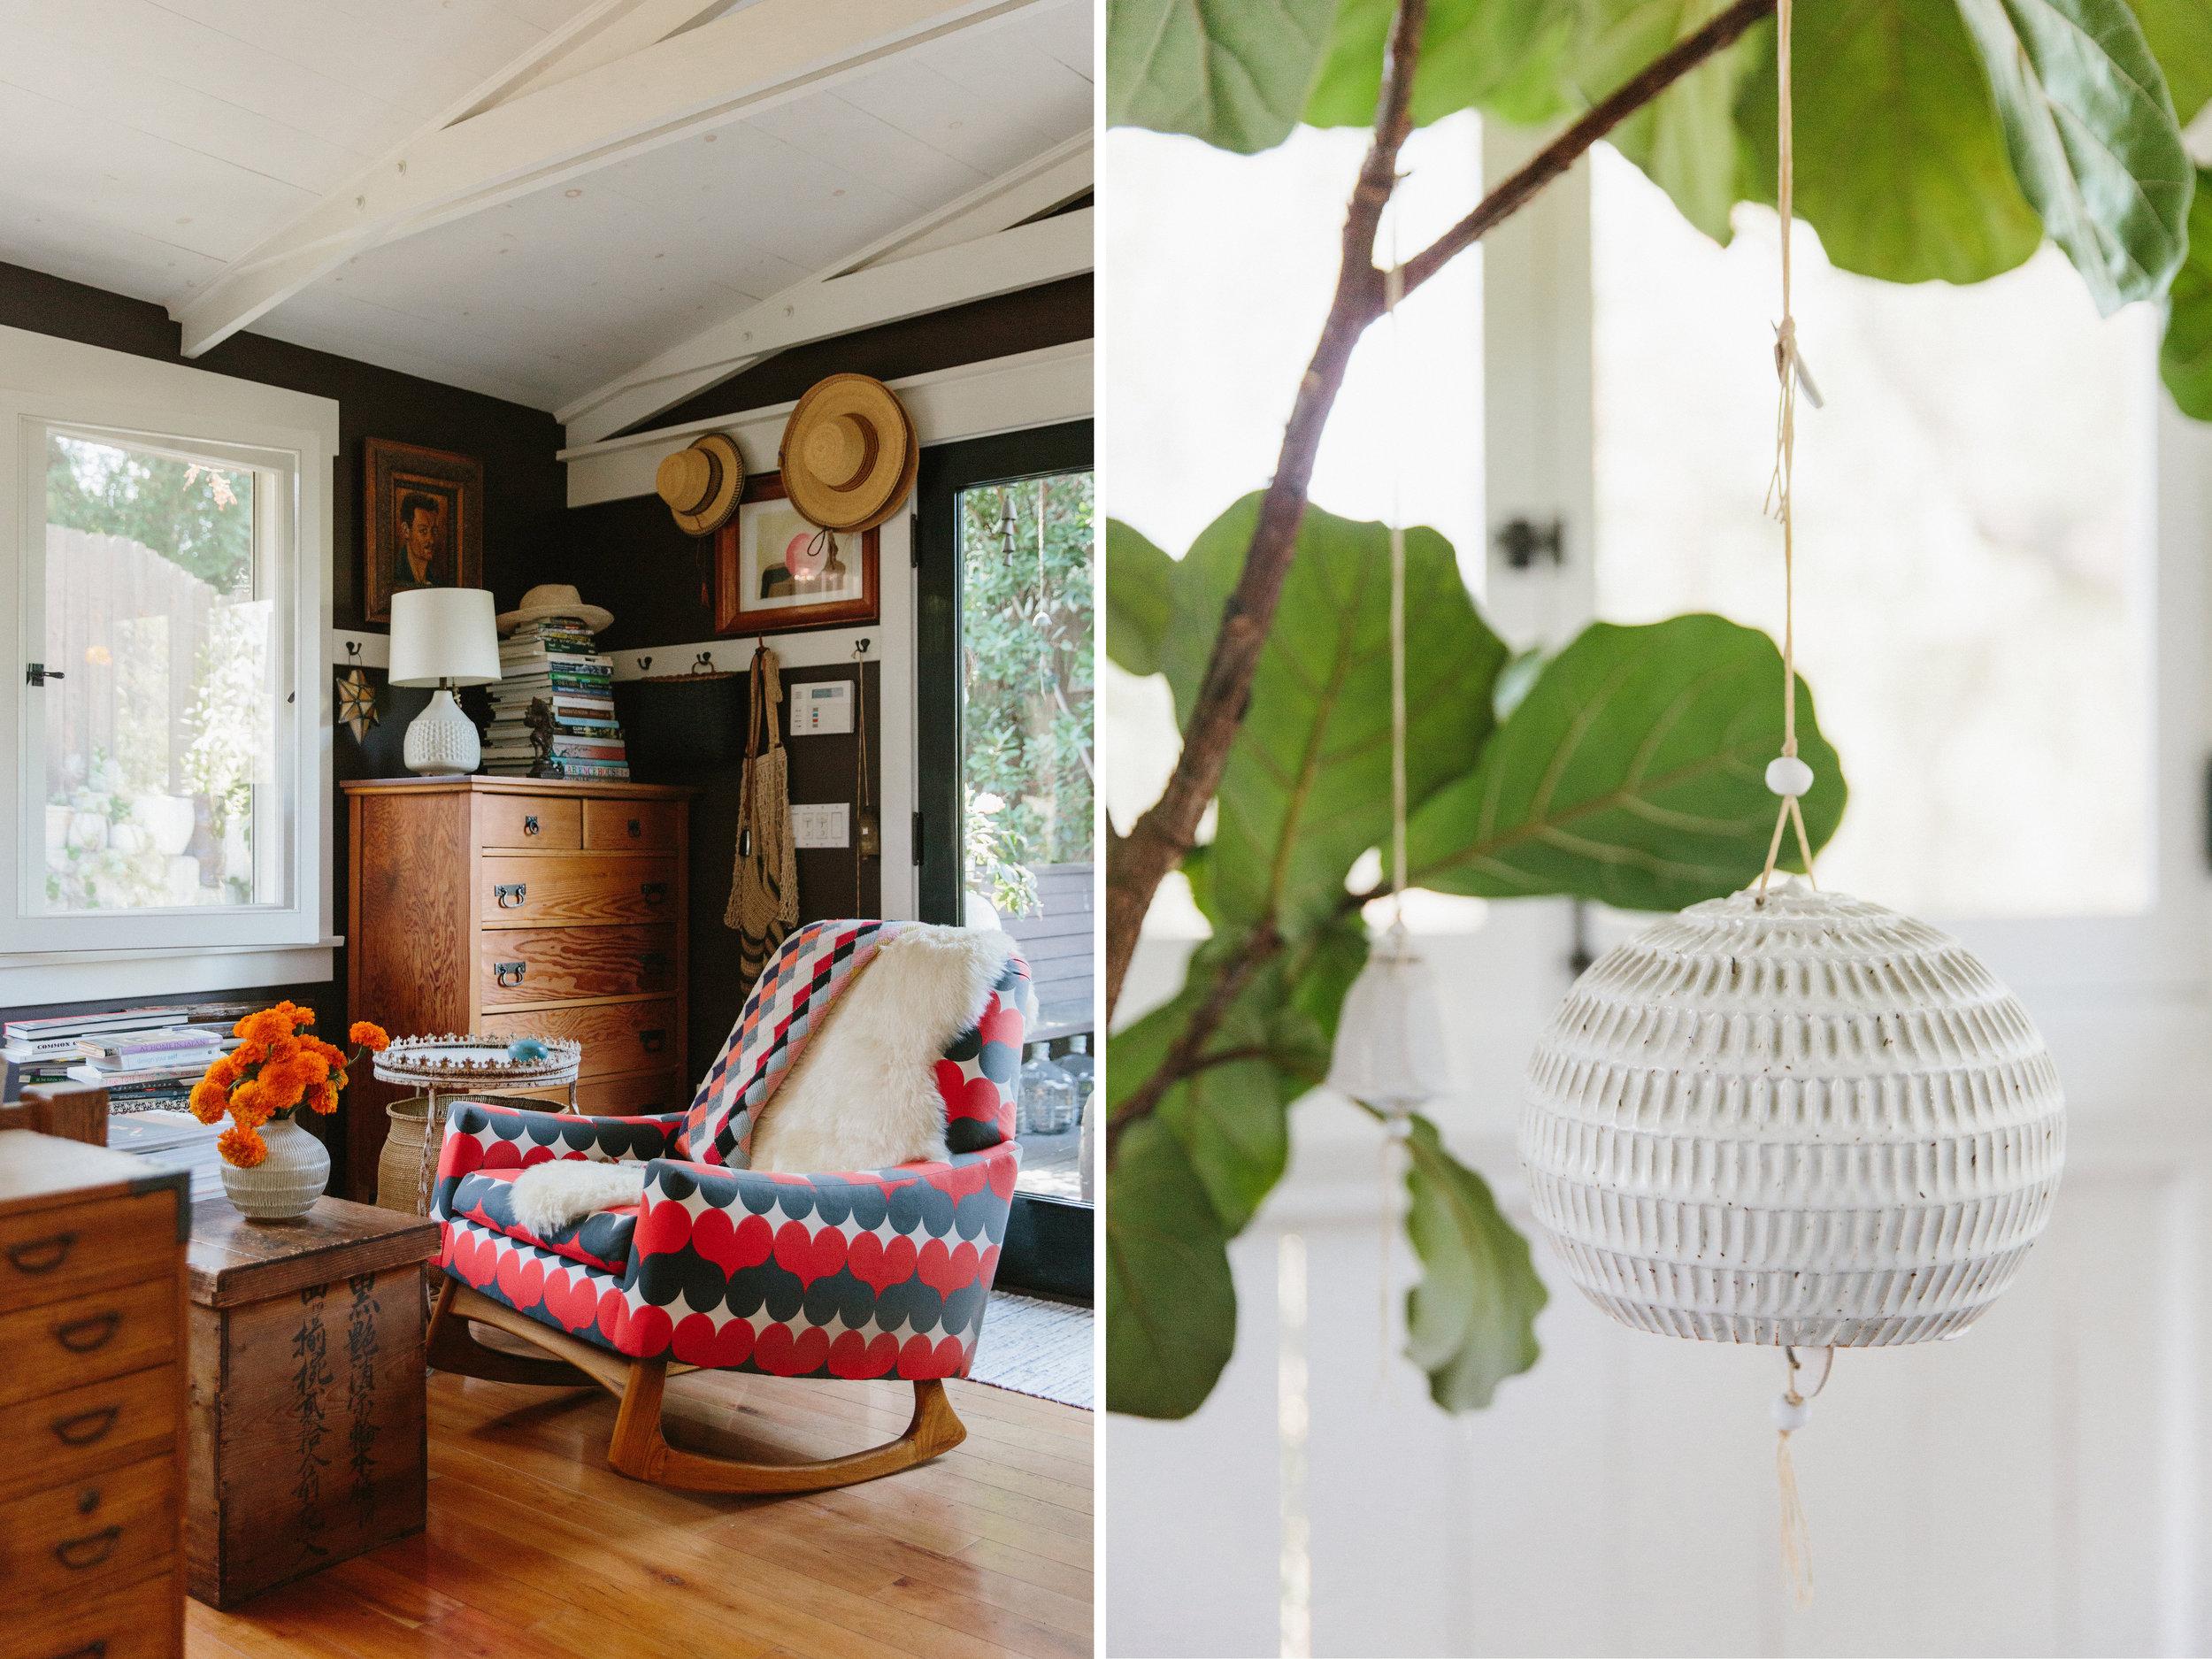 mt-washington-pottery_jenni-kayne_los-angeles-editorial-studio-home-tour_nicki-sebastian_2.jpg